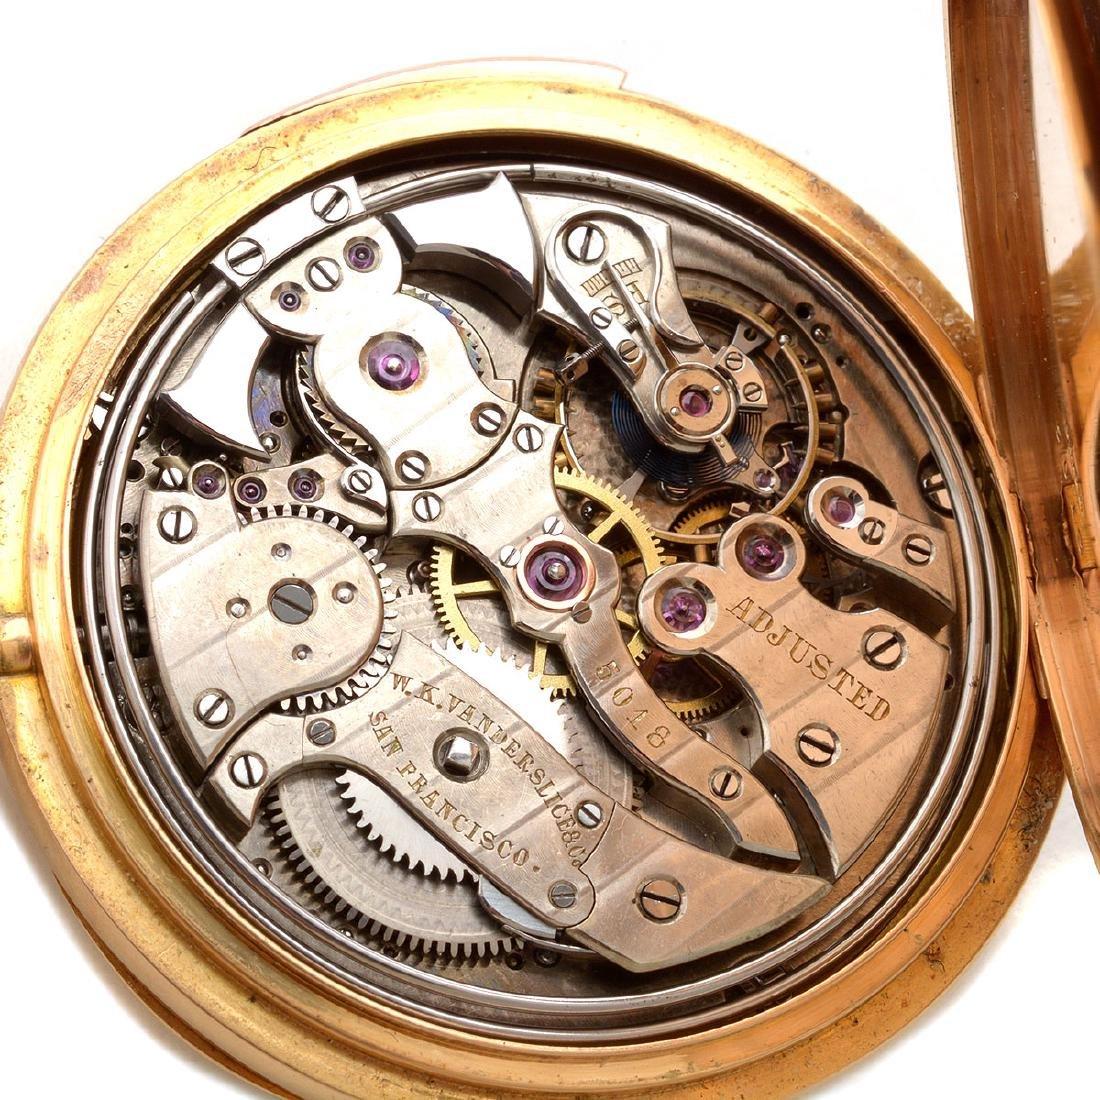 W.K. Vanderslice & Co. 18k Yellow Gold Minute Repeater - 6